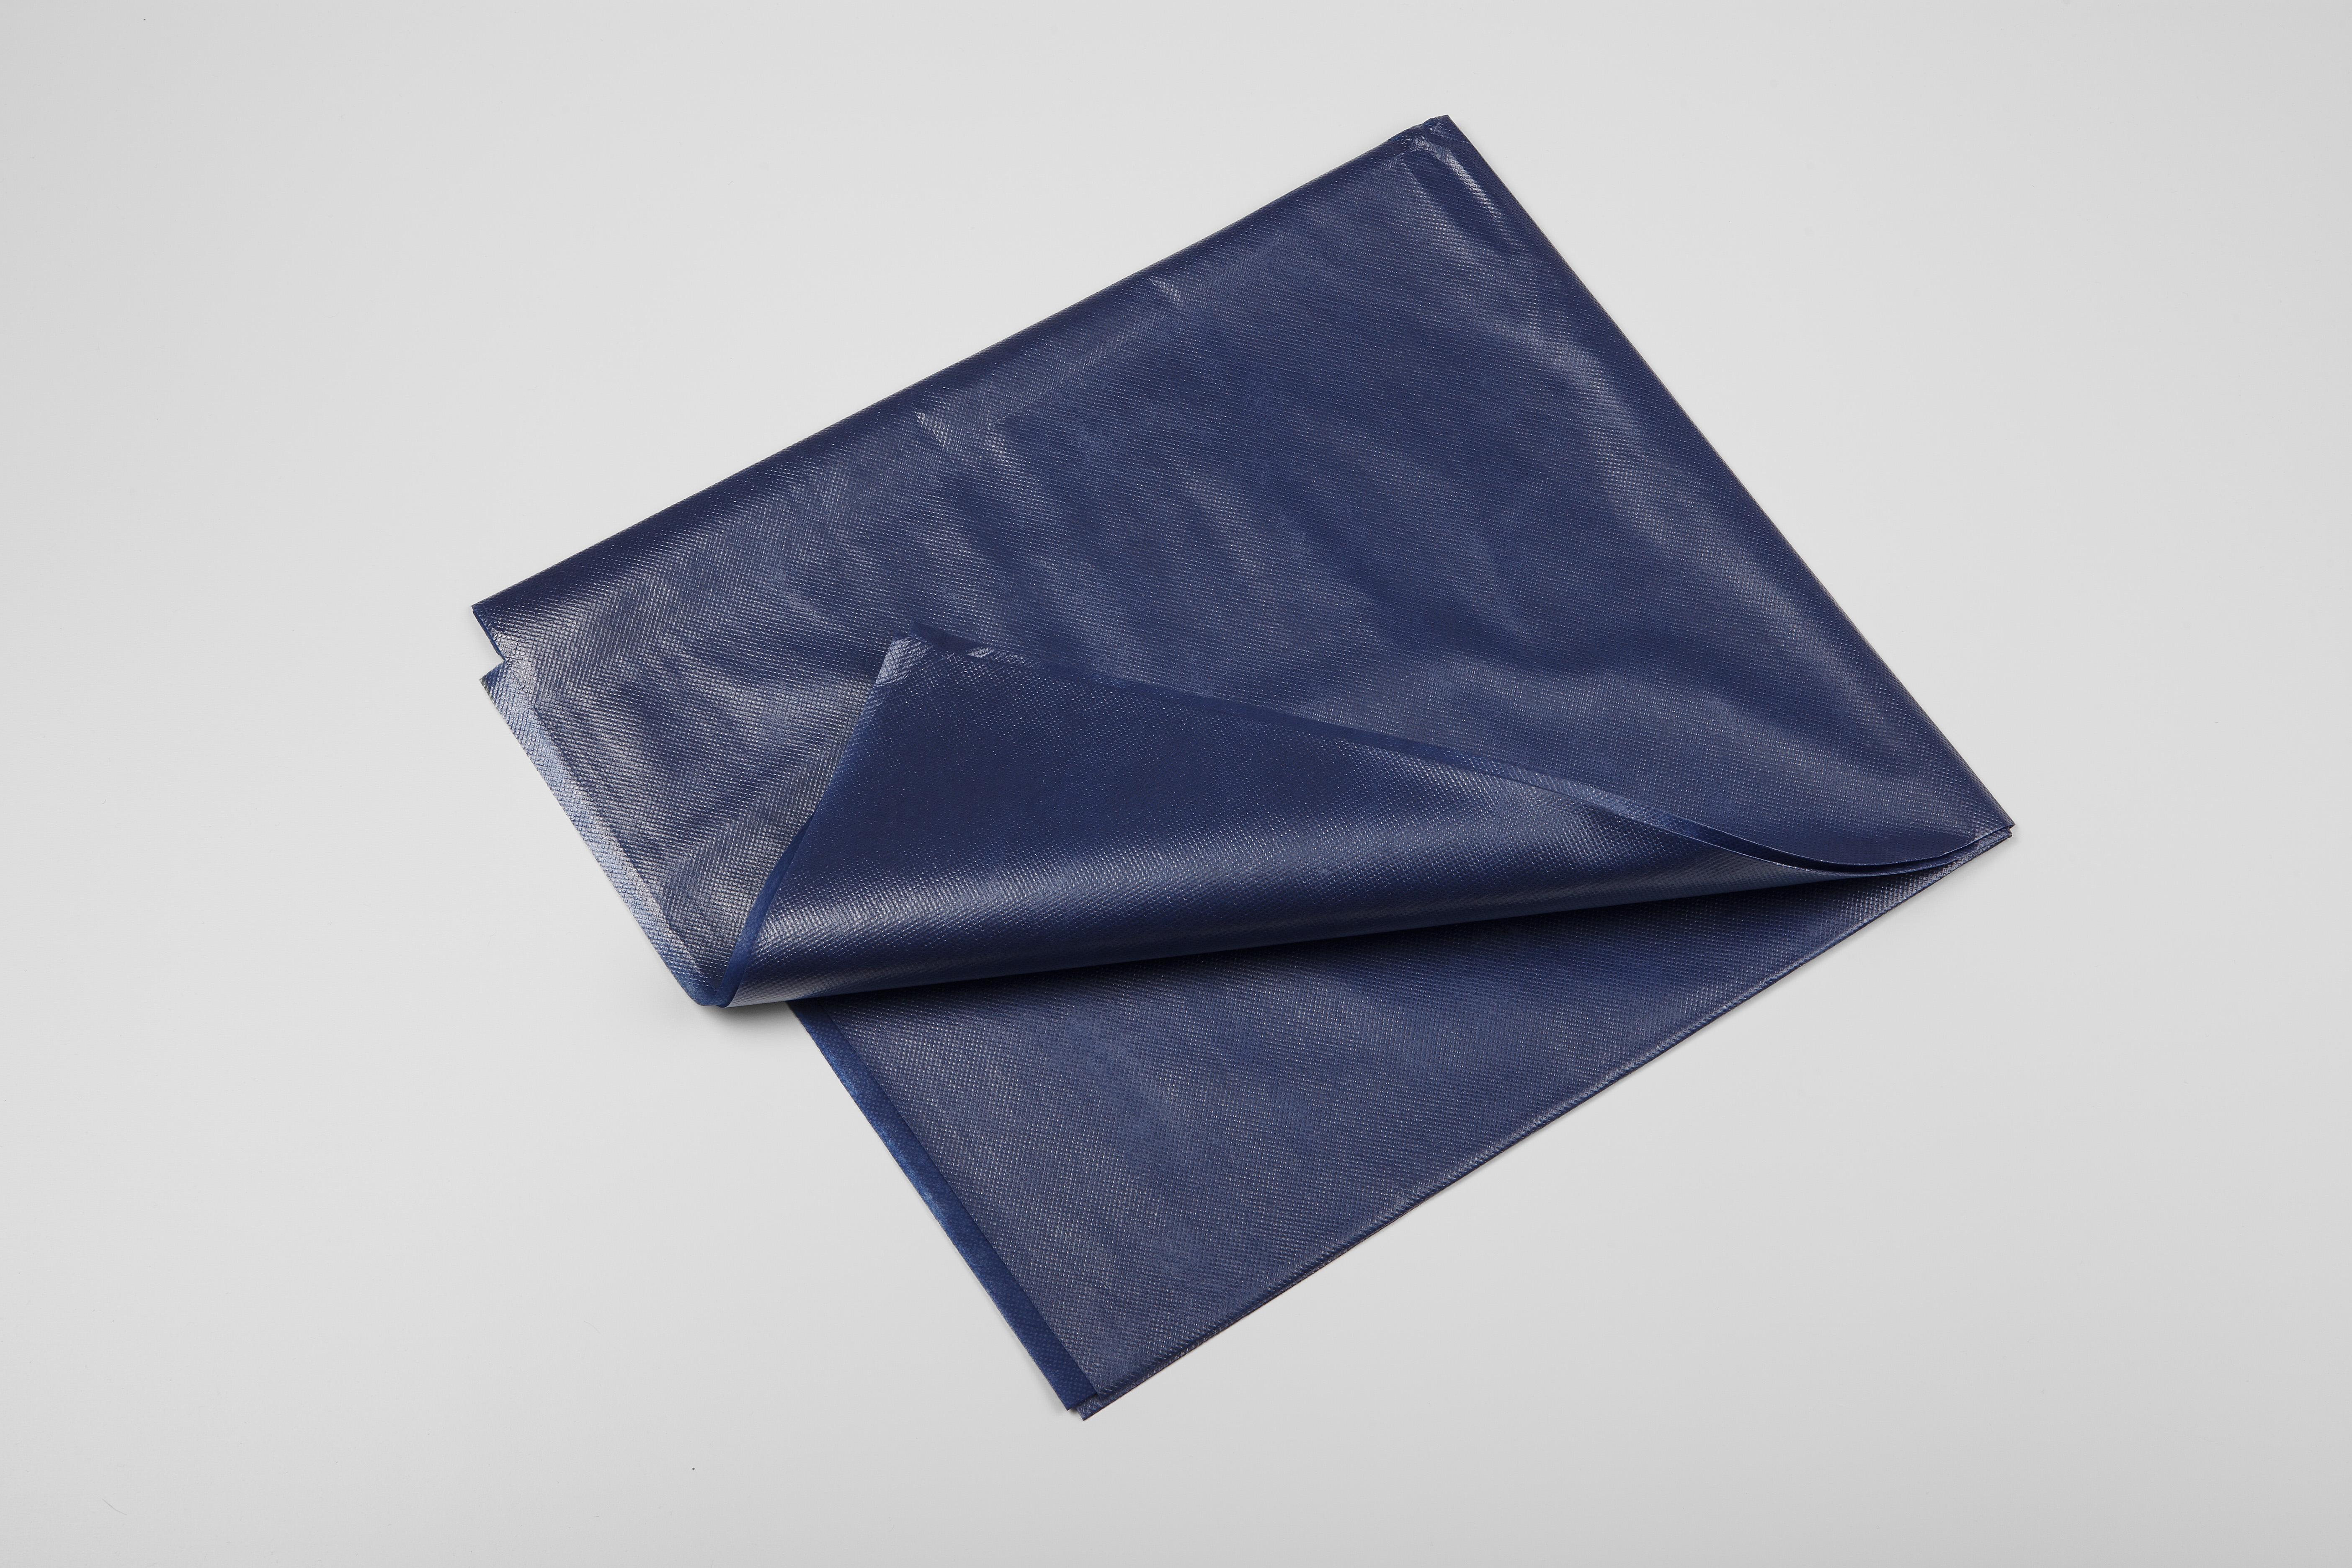 Einmalvlieslaken 200x100cm blau